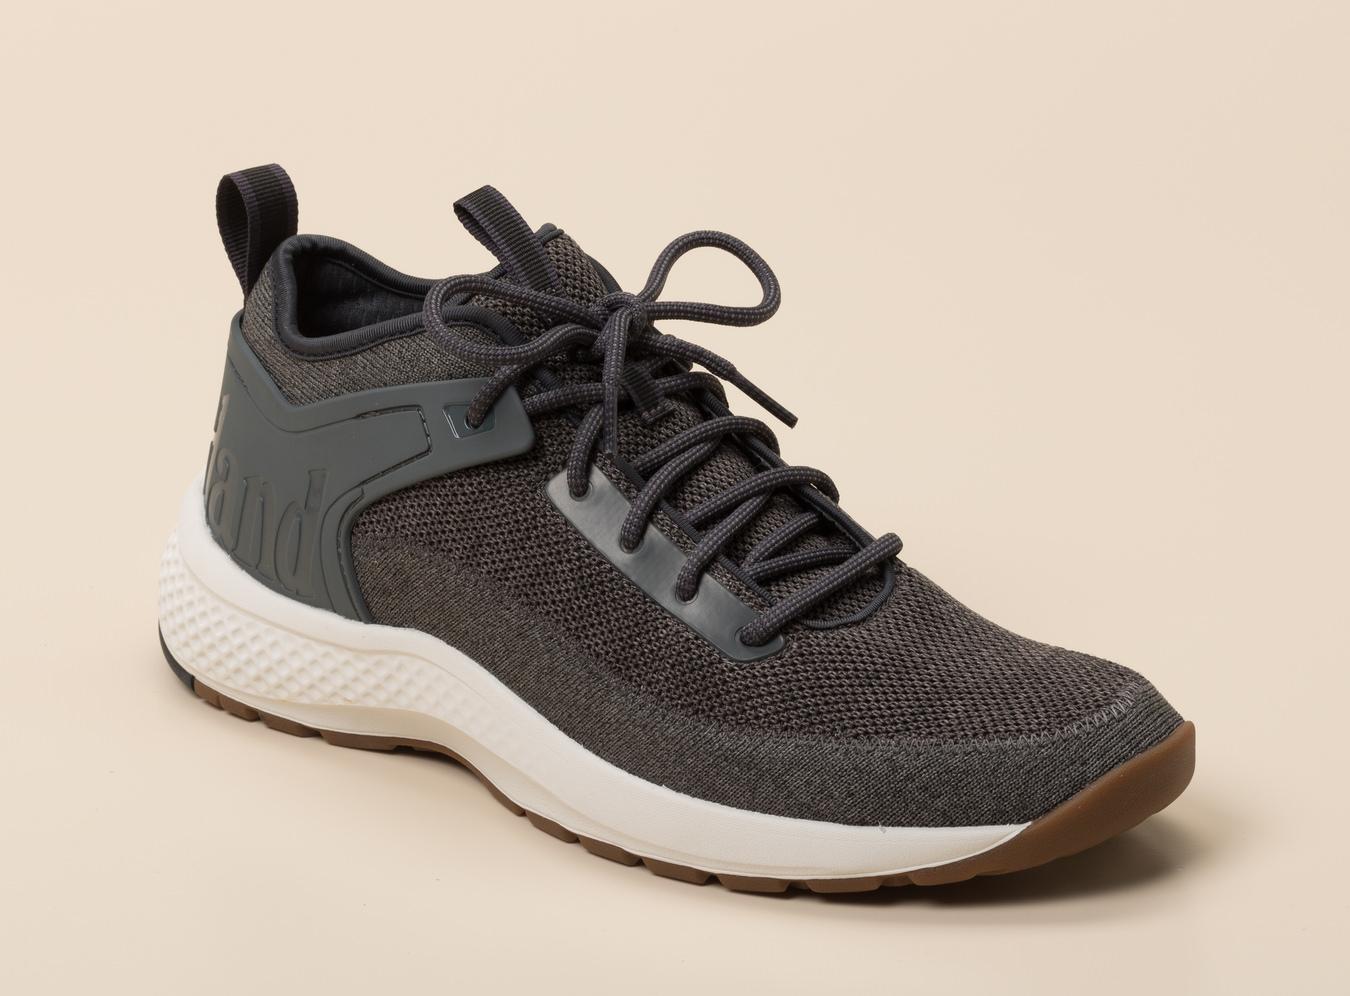 Timberland Herren Sneaker in grau kaufen | Zumnorde Online Shop